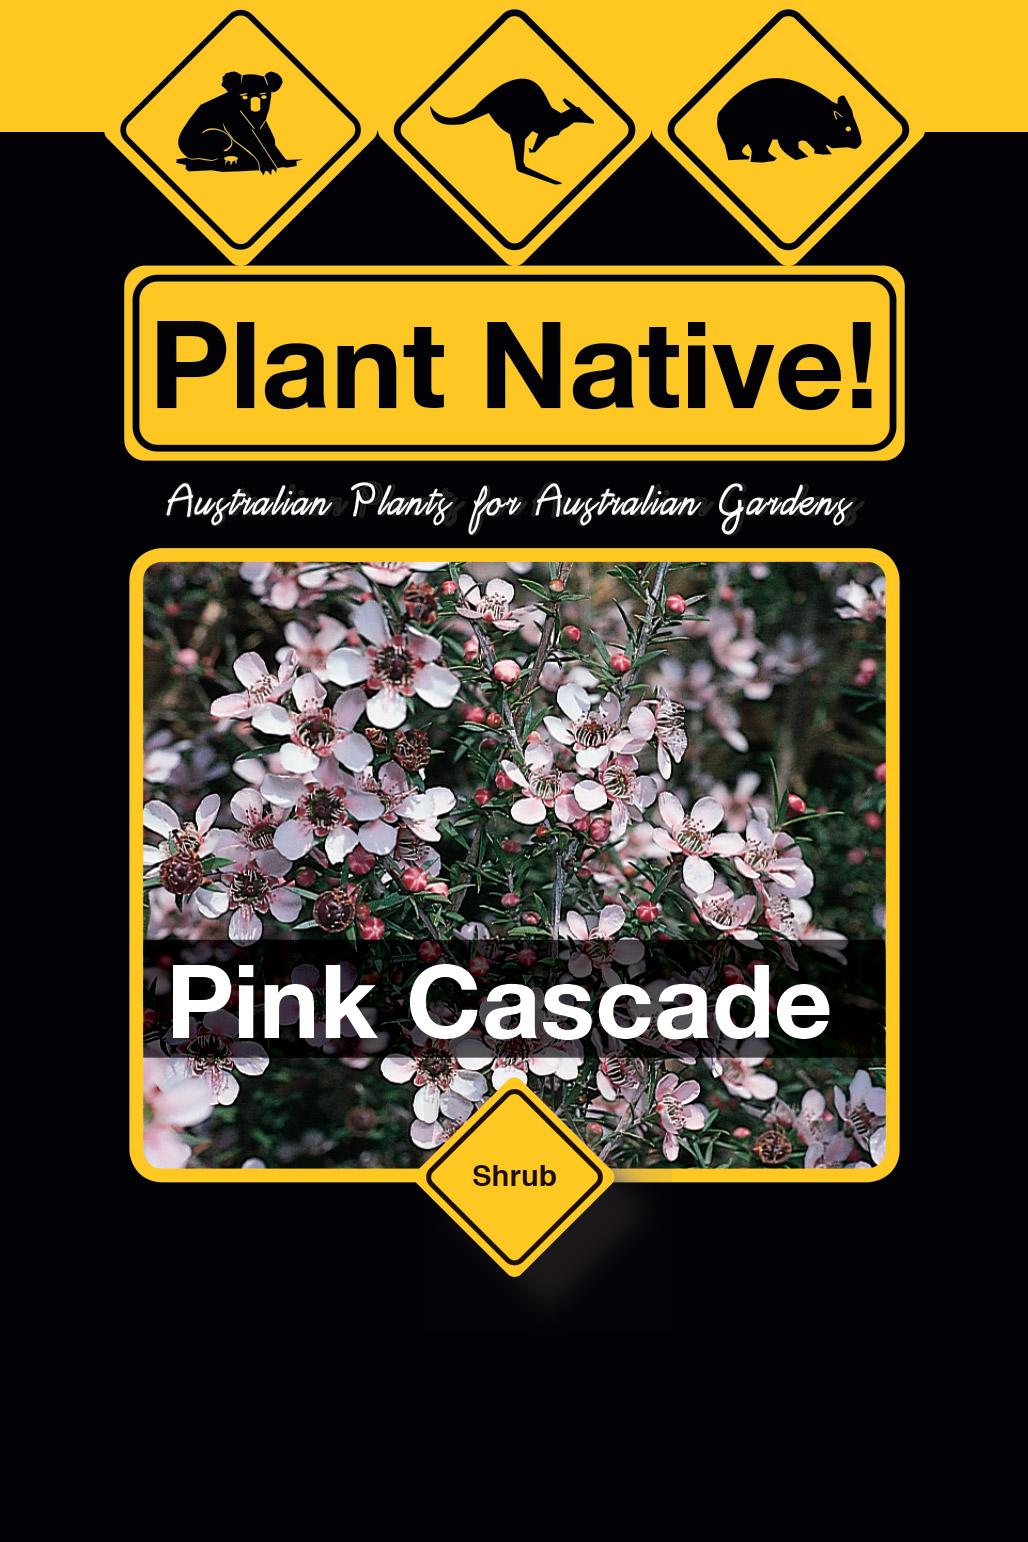 Pink Cascade - Plant Native!